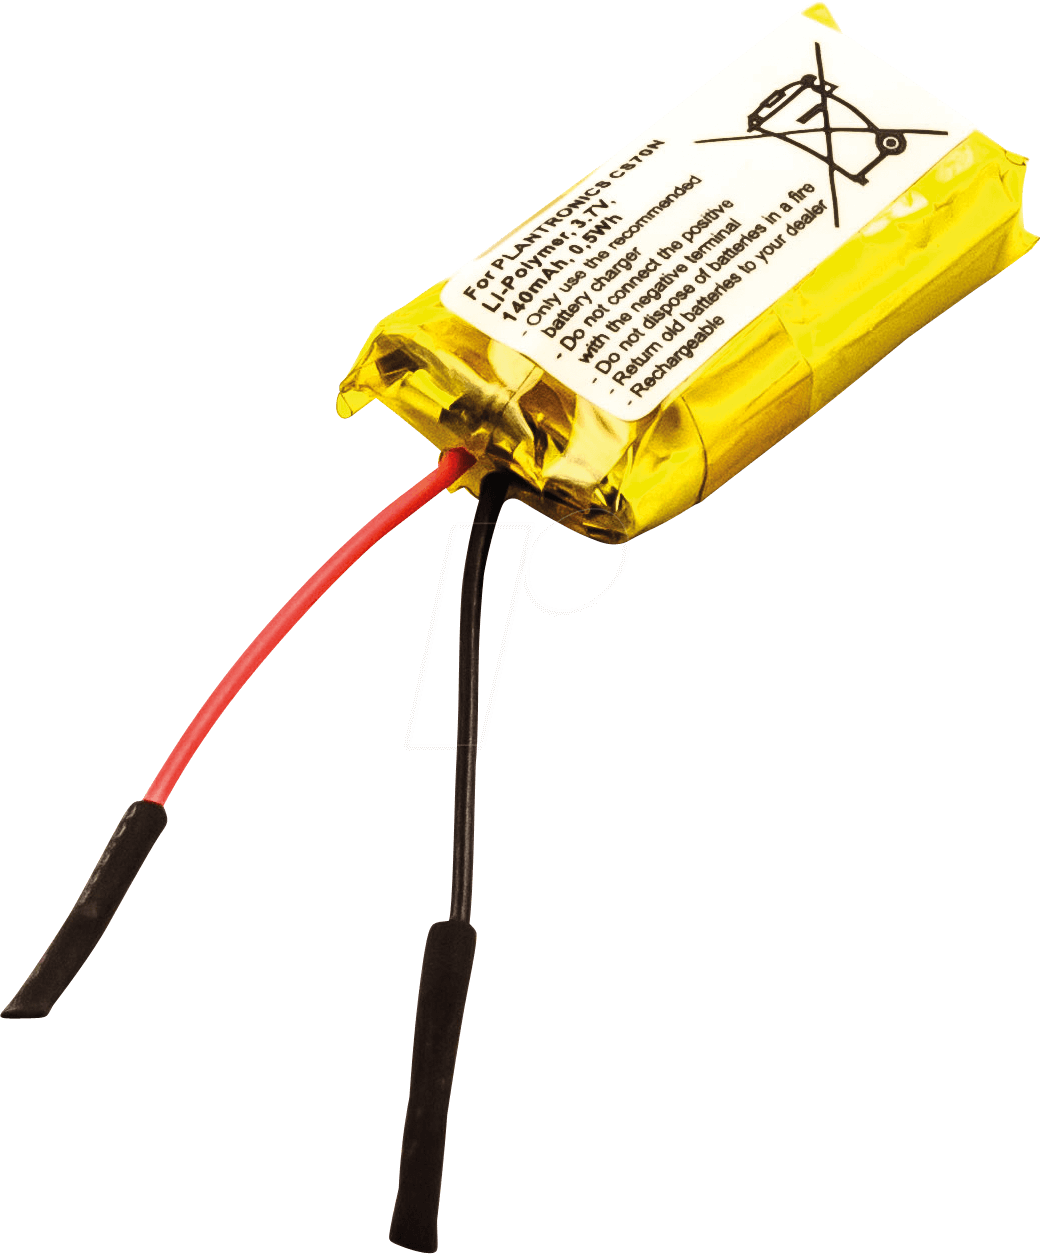 AKKU 30851 - Headset-Akku für Plantronics-Geräte, Li-Po, 140 mAh